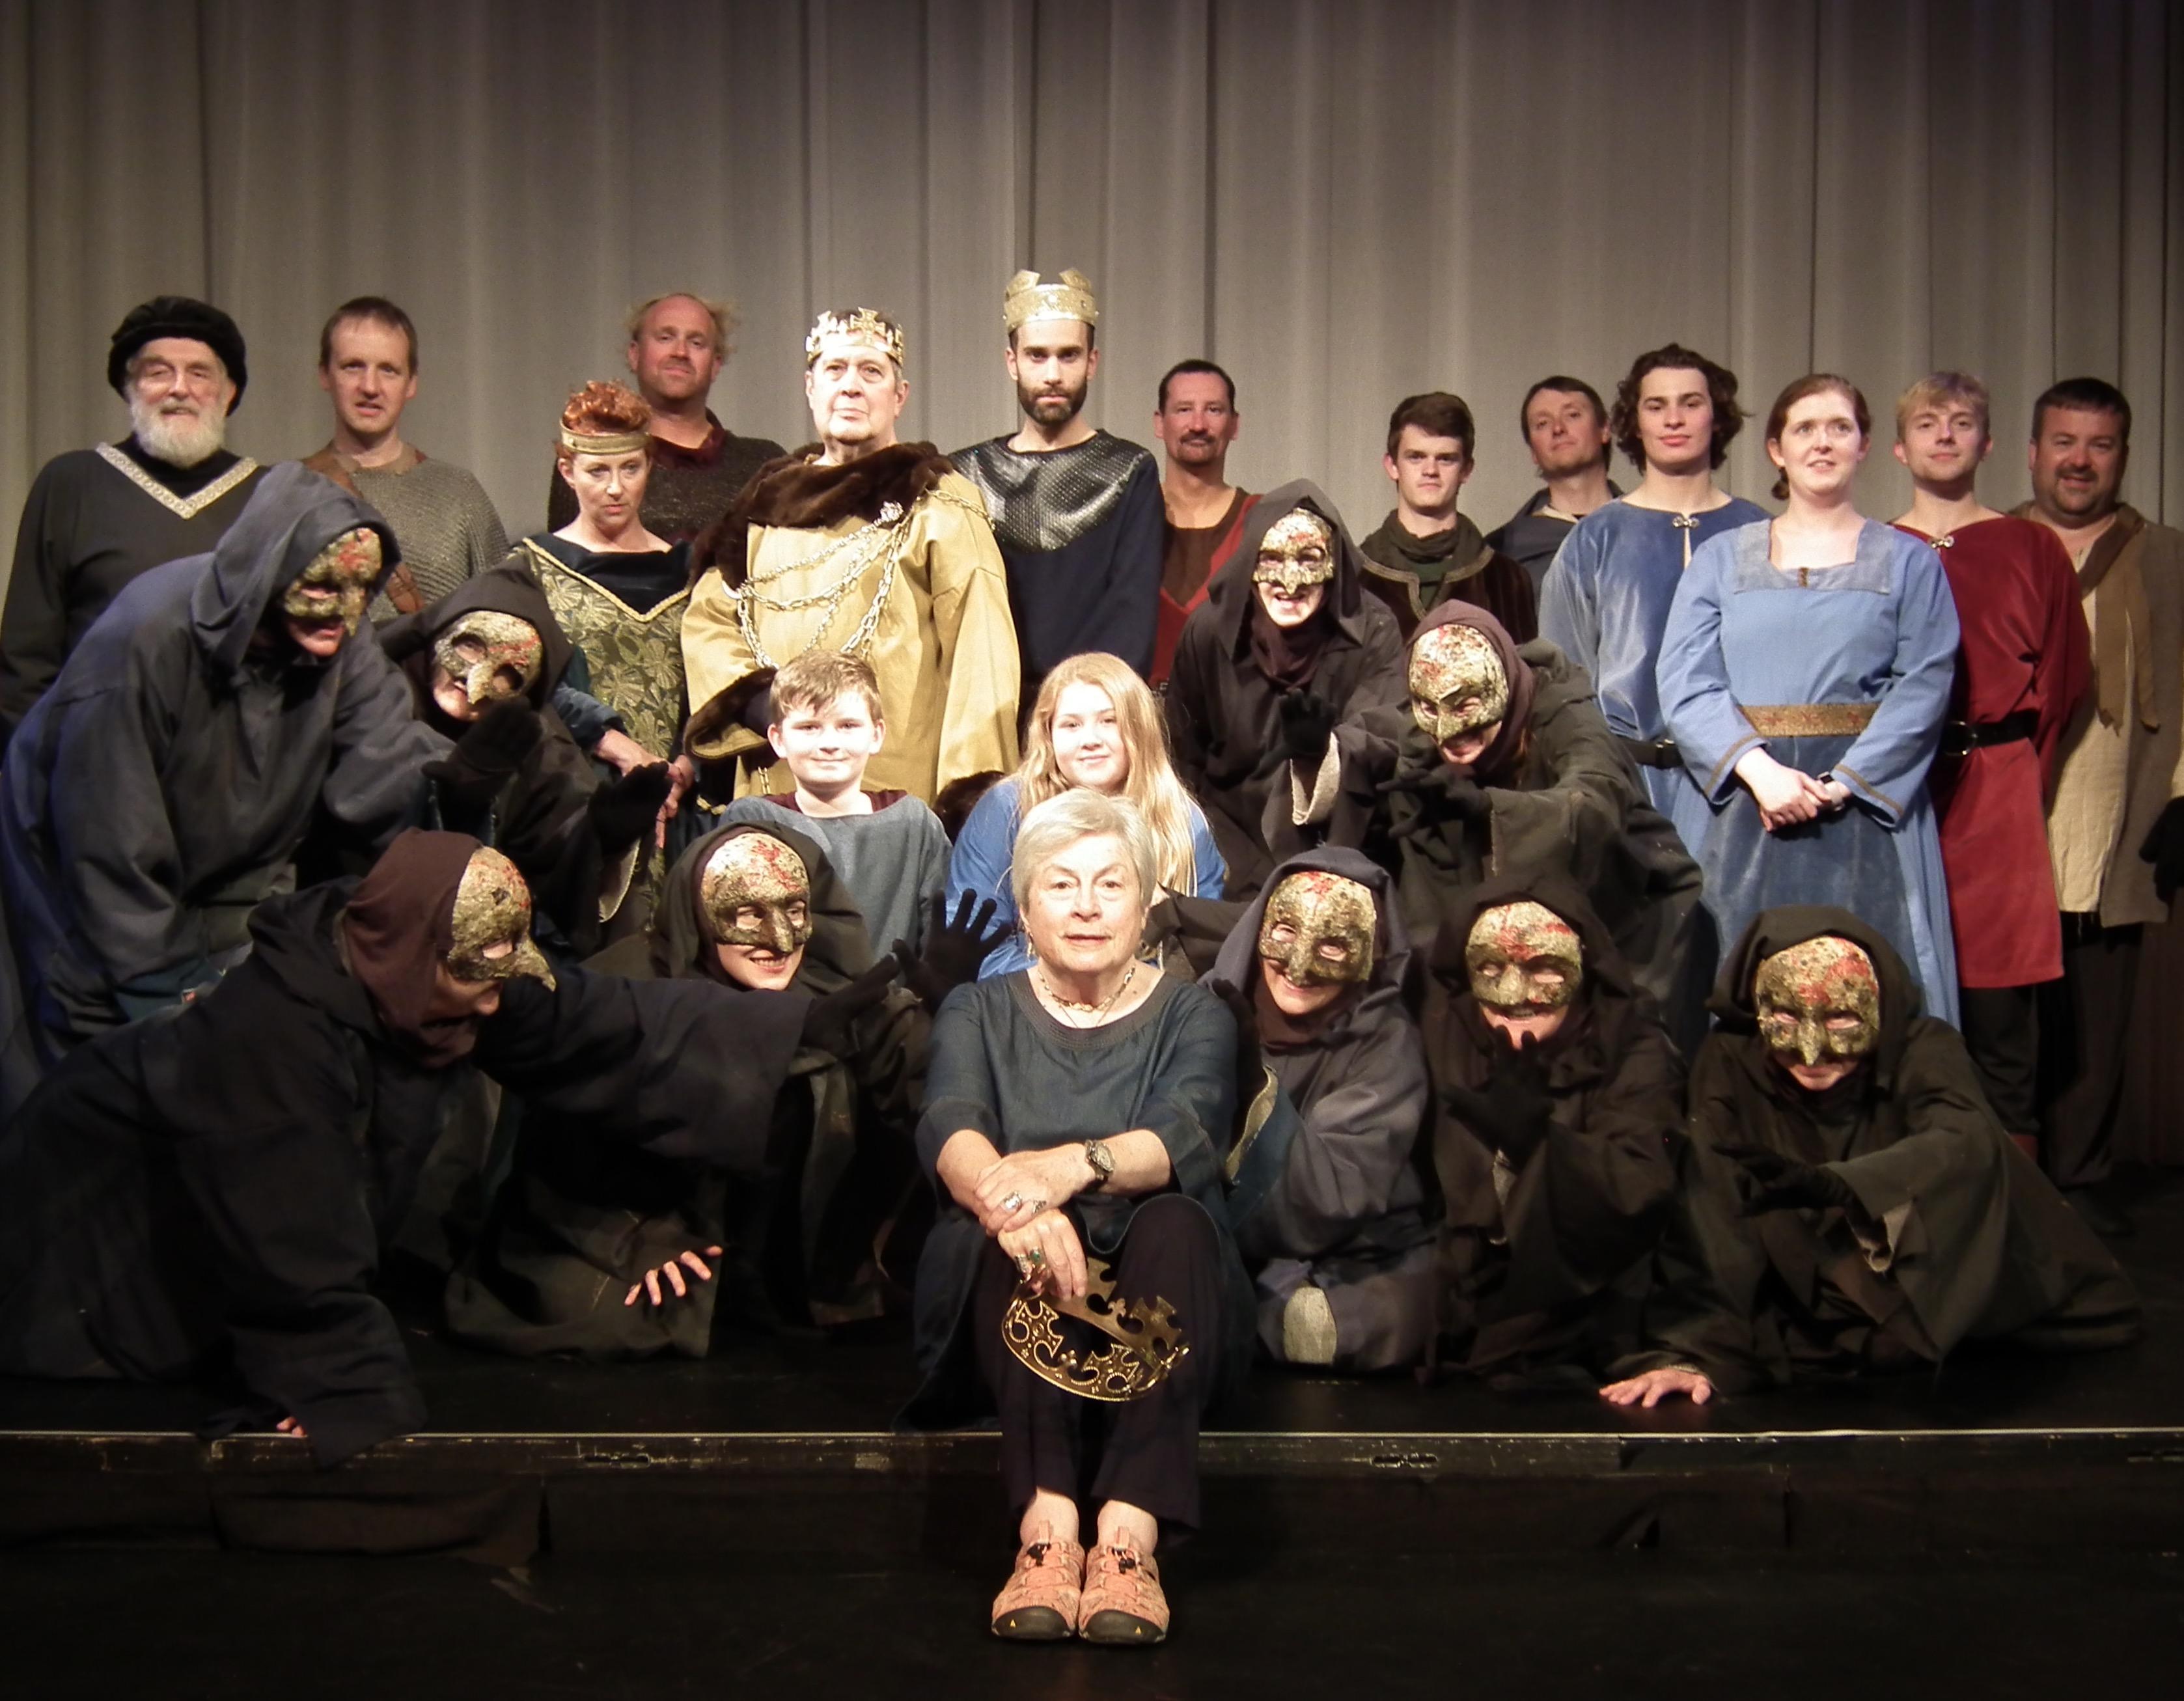 Stromness Drama Club's Macbeth